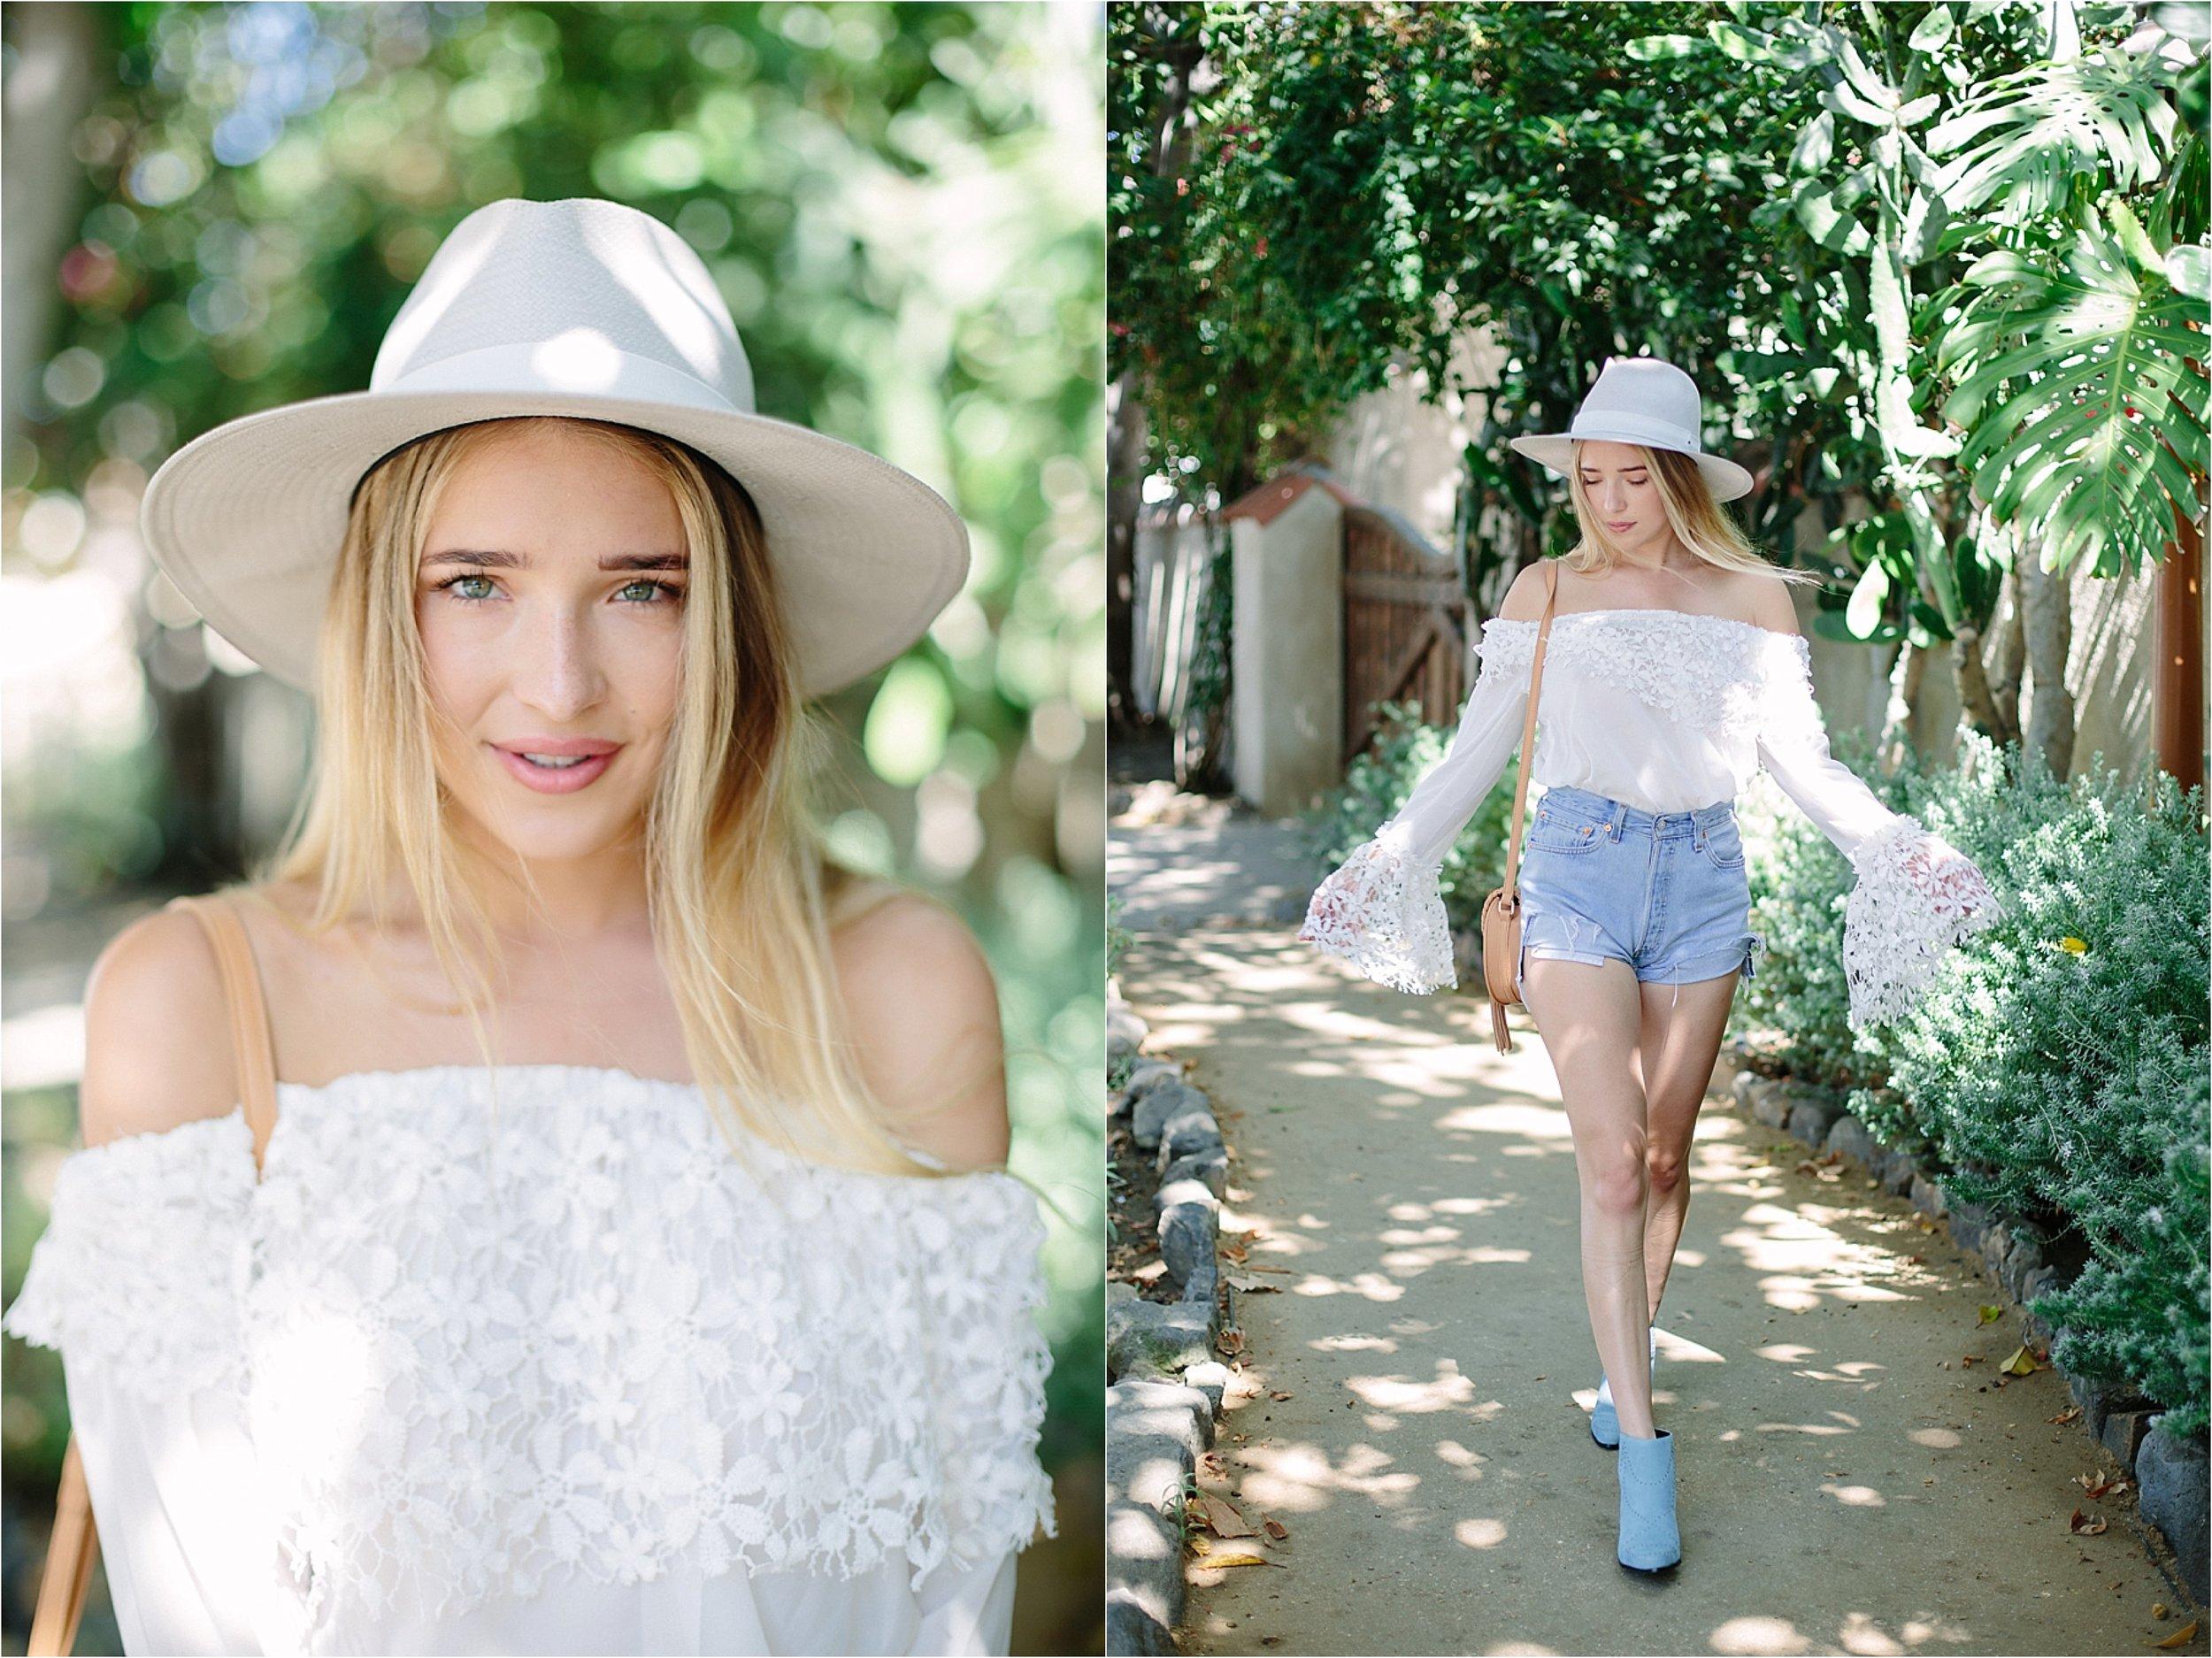 The Grove LA Fashion Photo Featuring Grey City Footwear